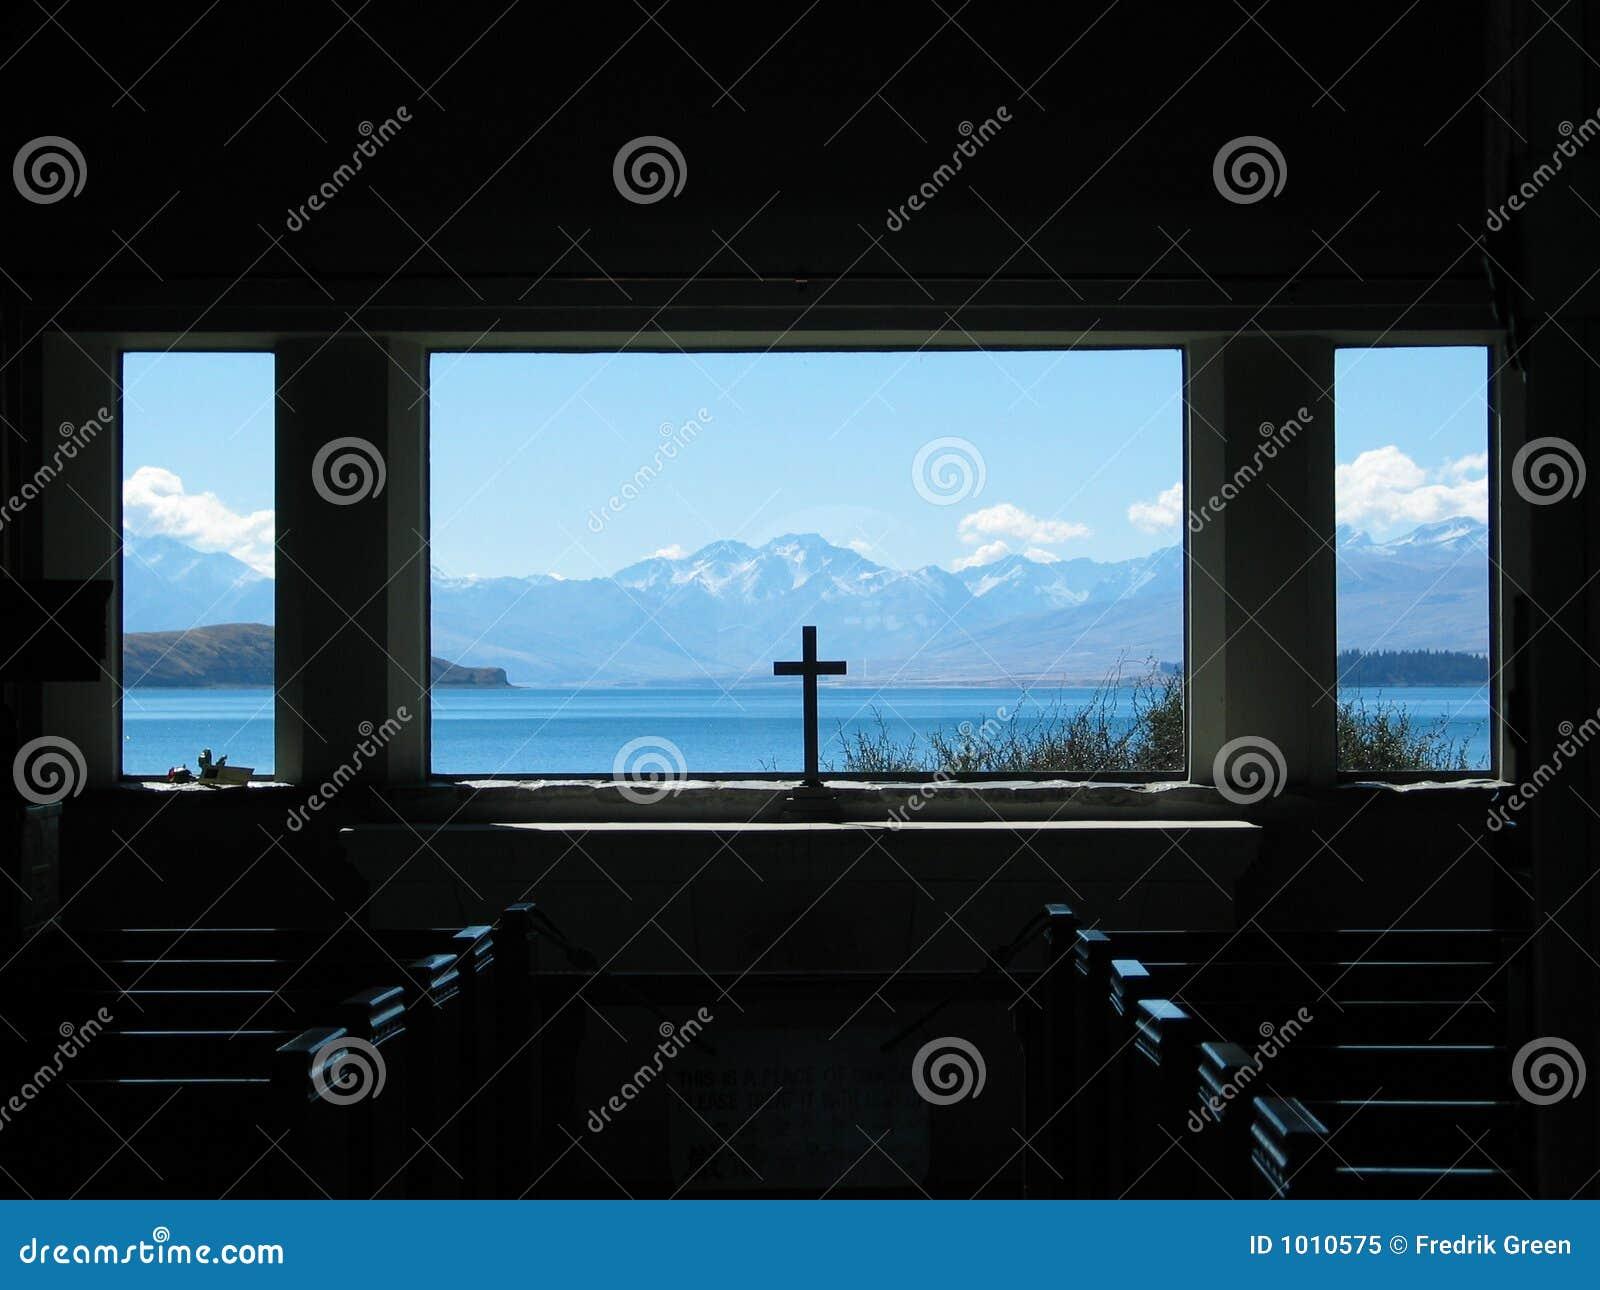 Lake Tekapo Church Window